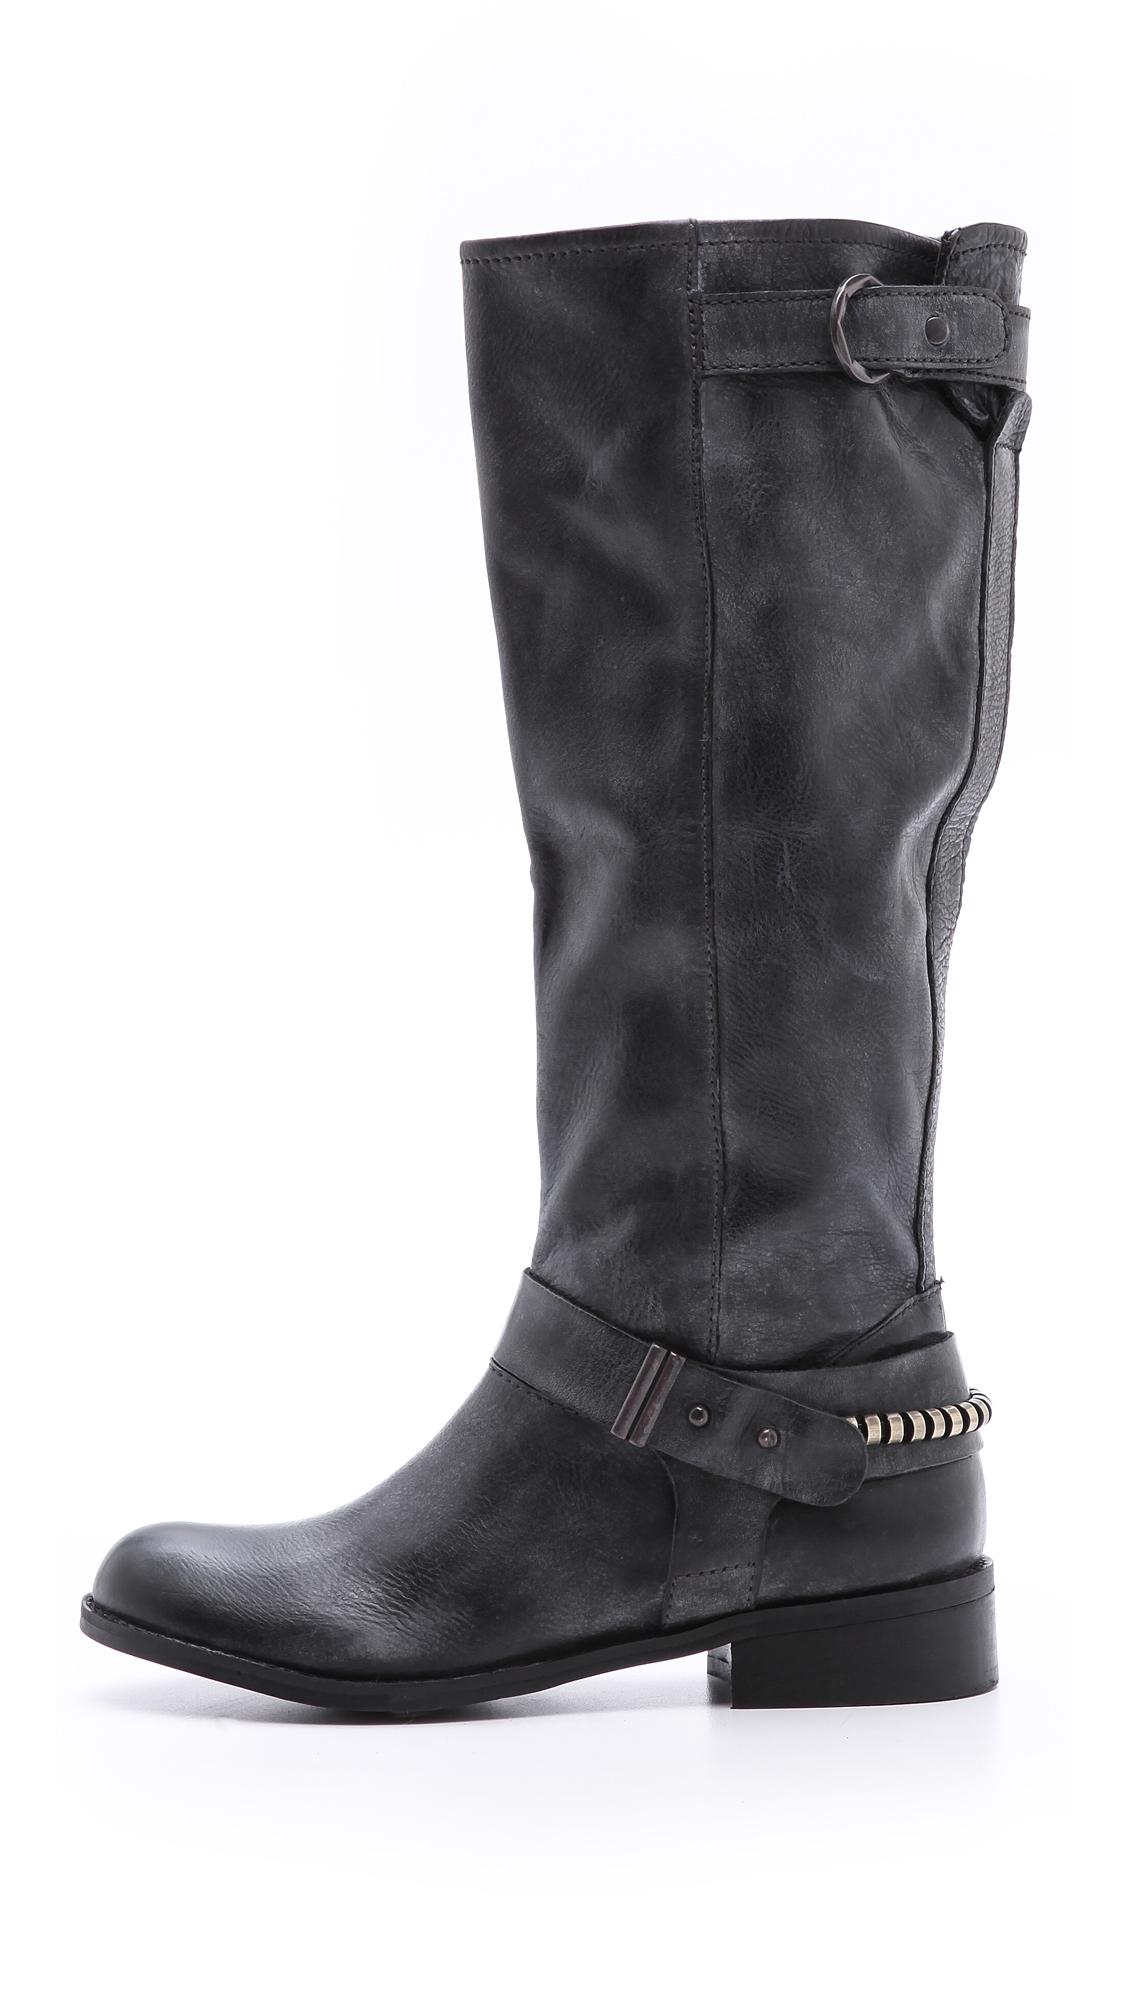 steven by steve madden ryley flat boots in black lyst